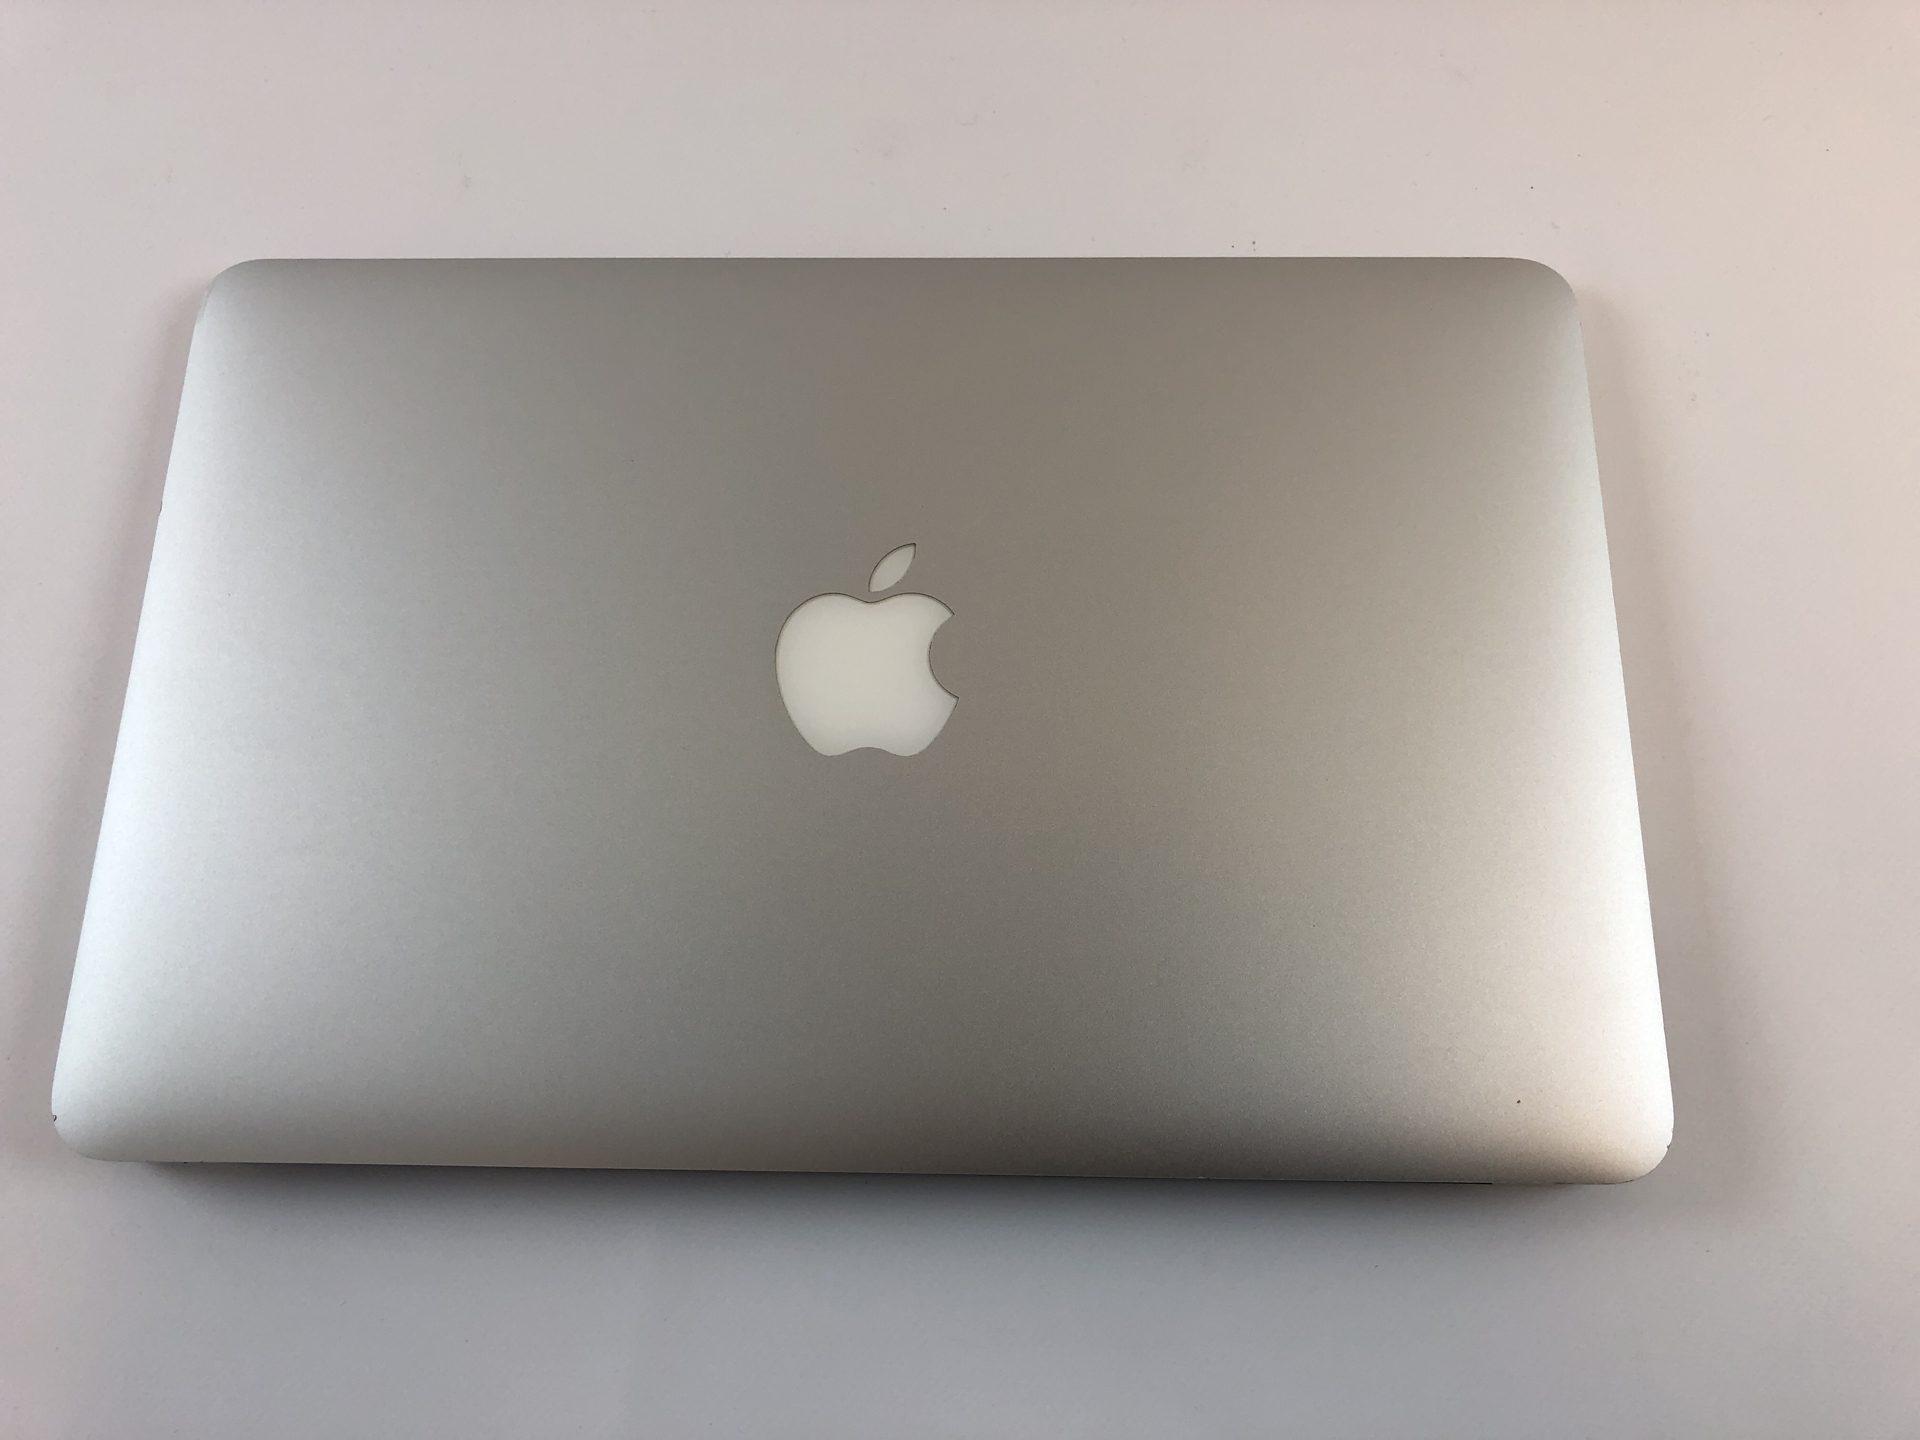 "MacBook Air 11"" Early 2014 (Intel Core i7 1.7 GHz 8 GB RAM 512 GB SSD), Intel Core i7 1.7 GHz, 8 GB RAM, 512 GB SSD, Bild 3"